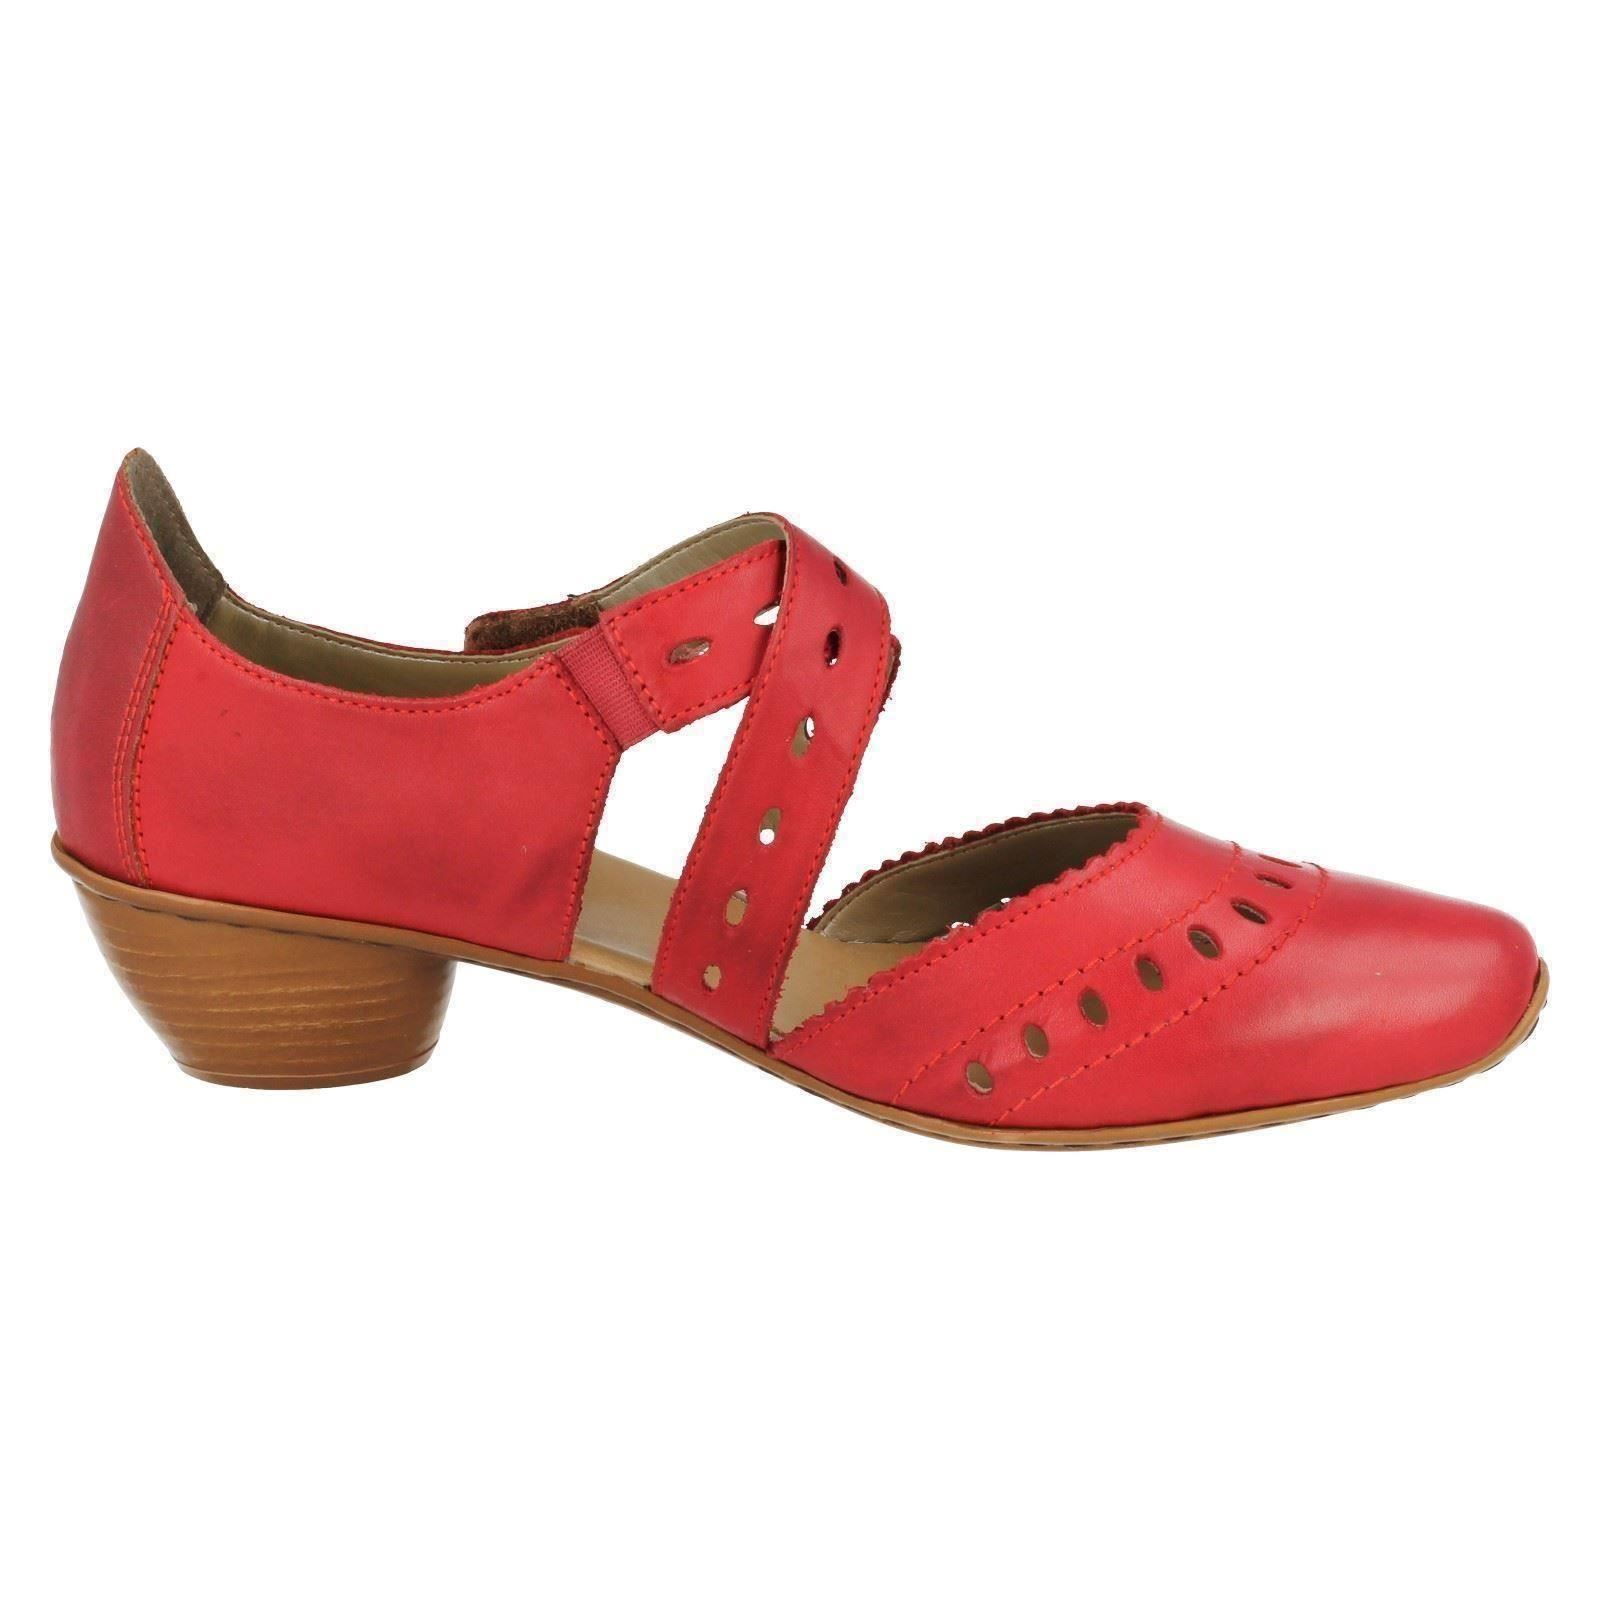 Rieker Ladies Shoes On Ebay